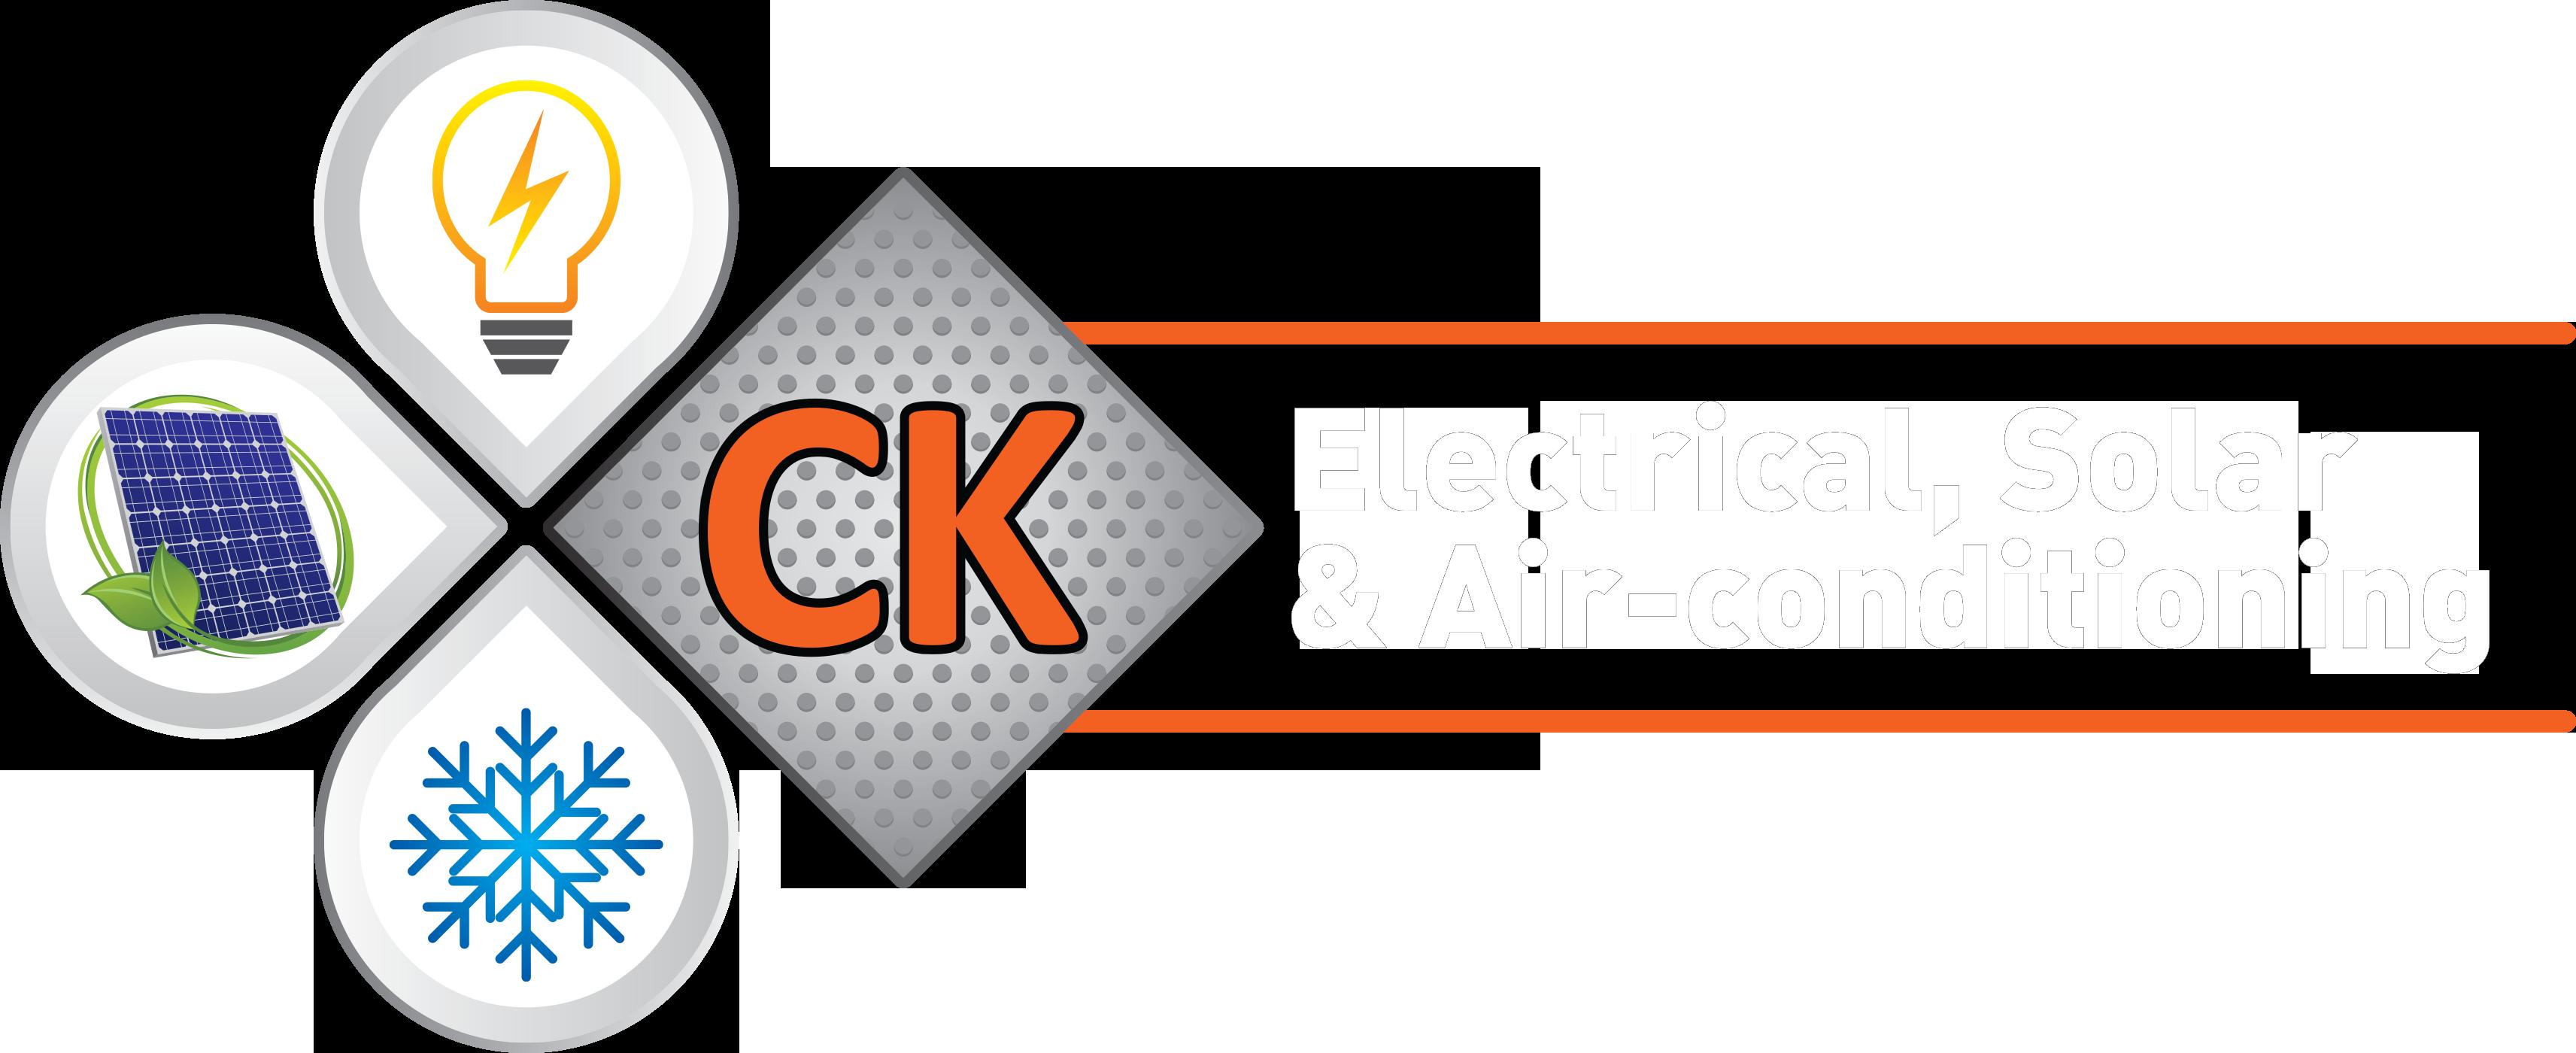 CK ESA | Electrical, Solar & Air-Conditioning Services Brisbane